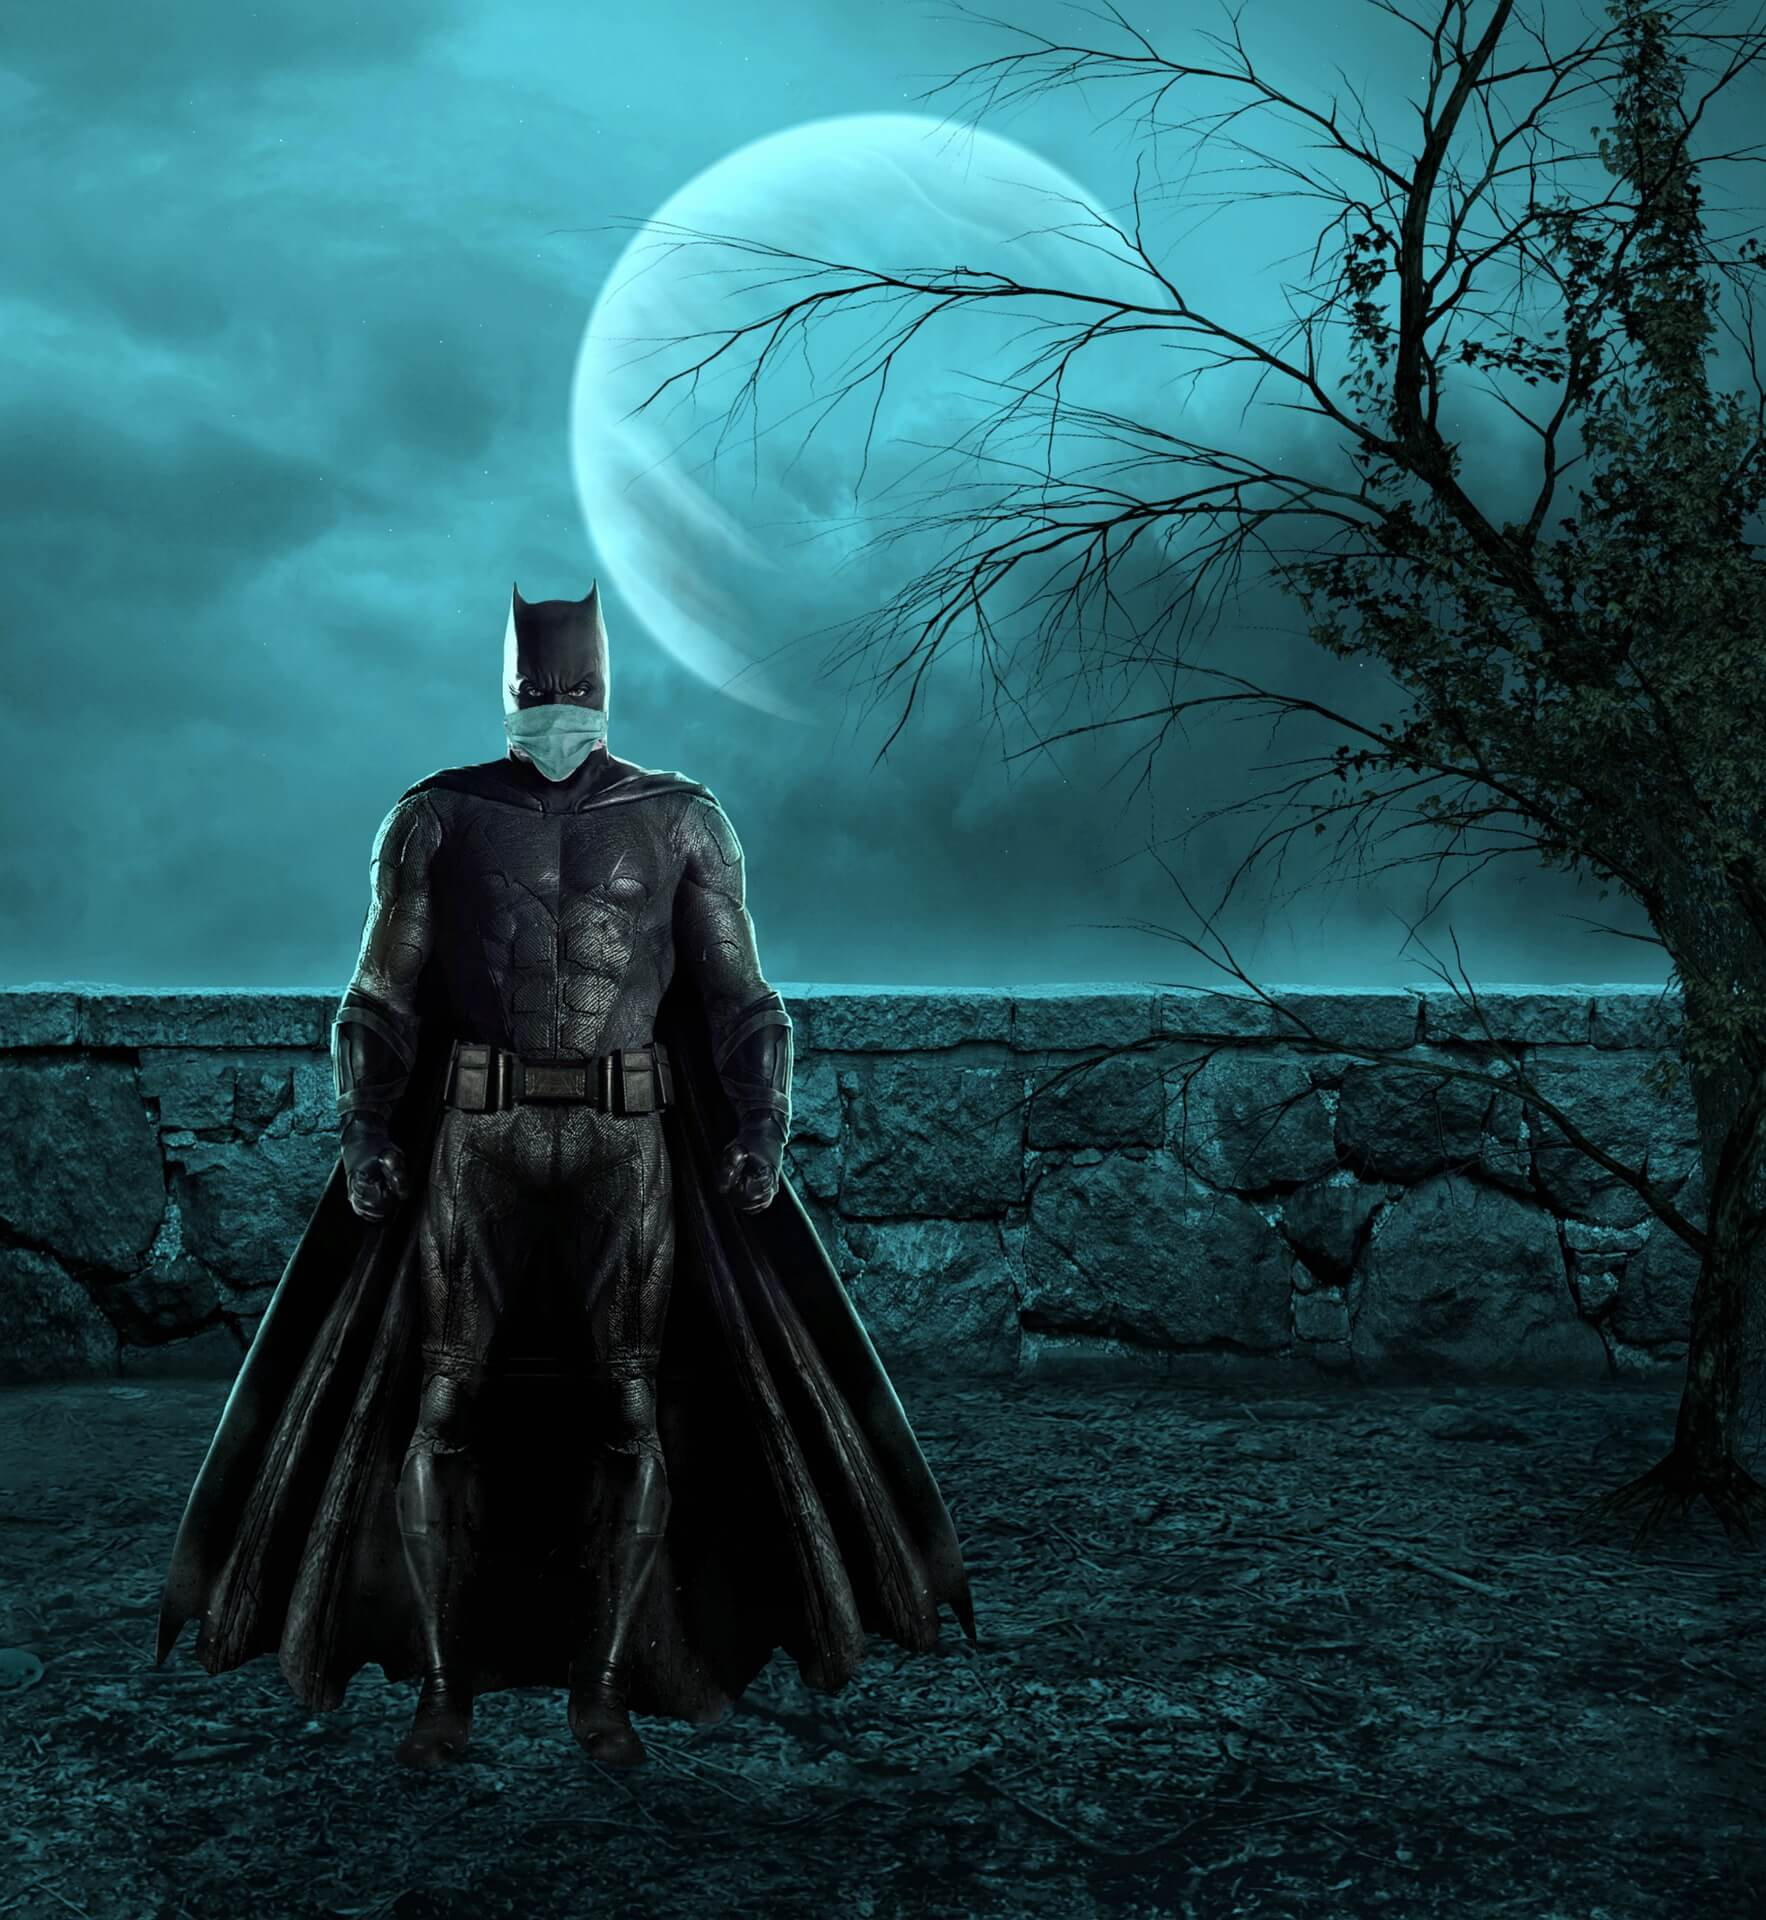 Batman wearing his mask t protect from coronavirus